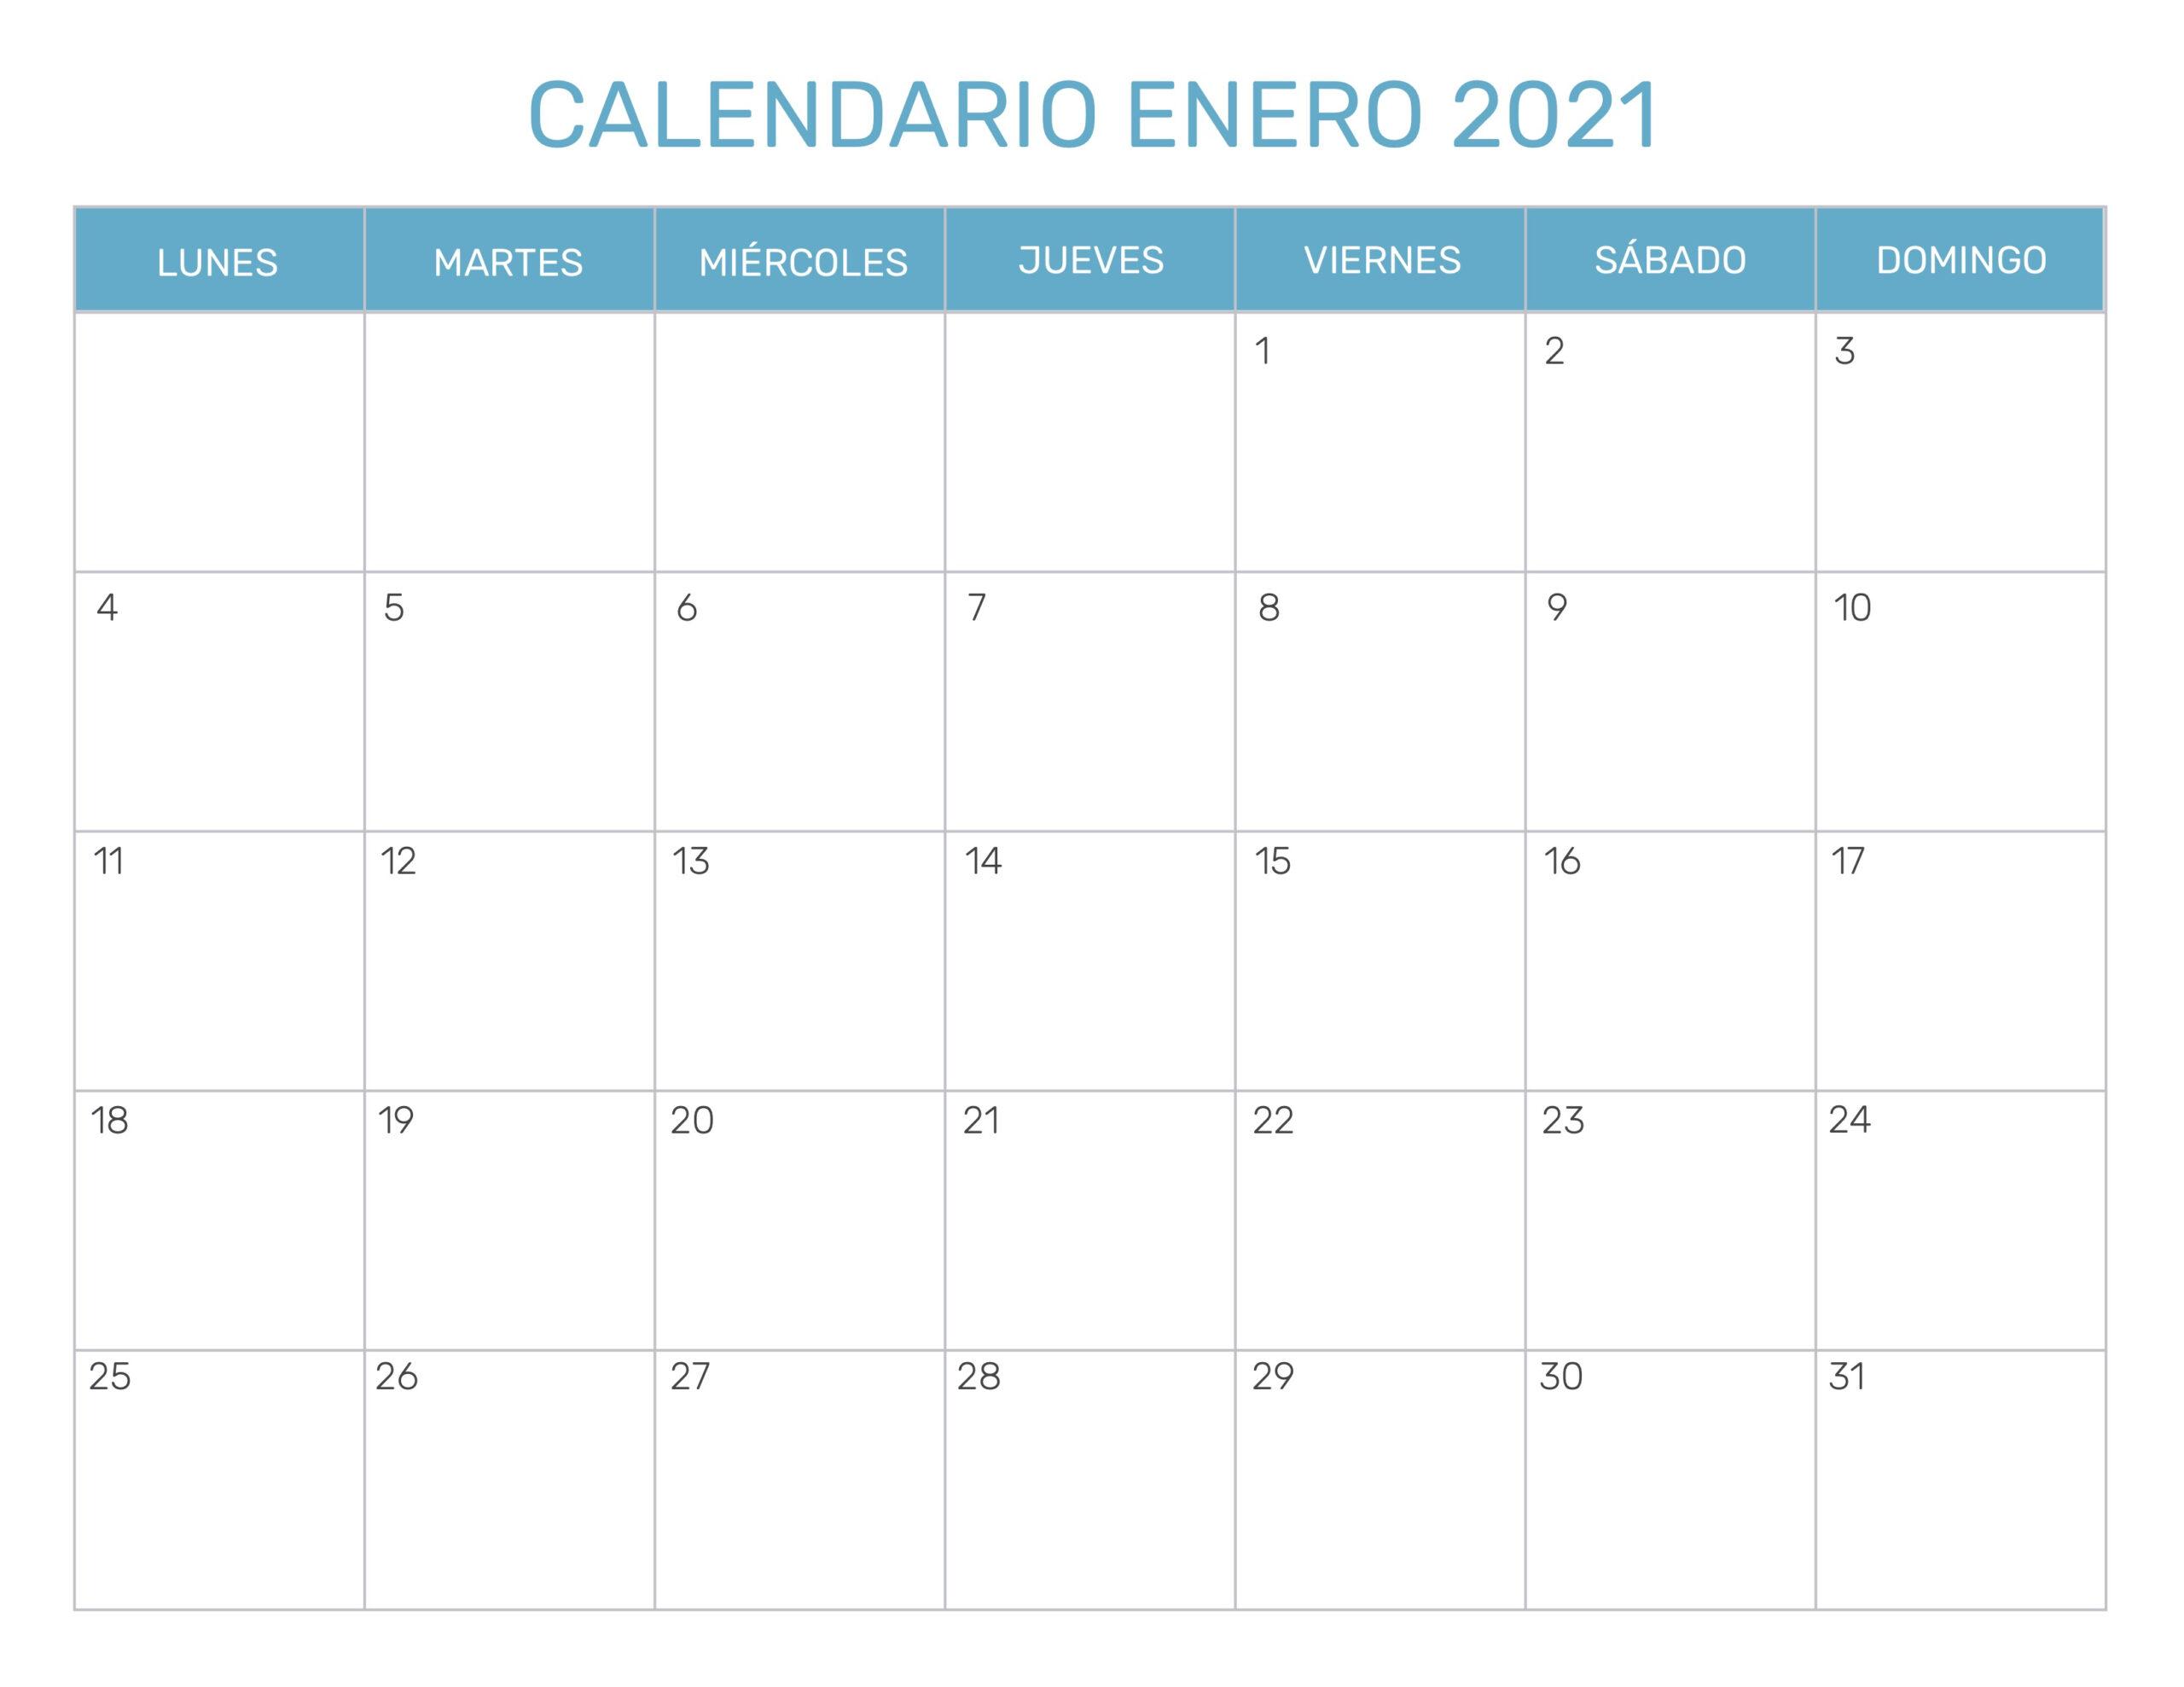 Calendario Mensual Para Imprimir Año 2021 for Calendario Vertex 2021